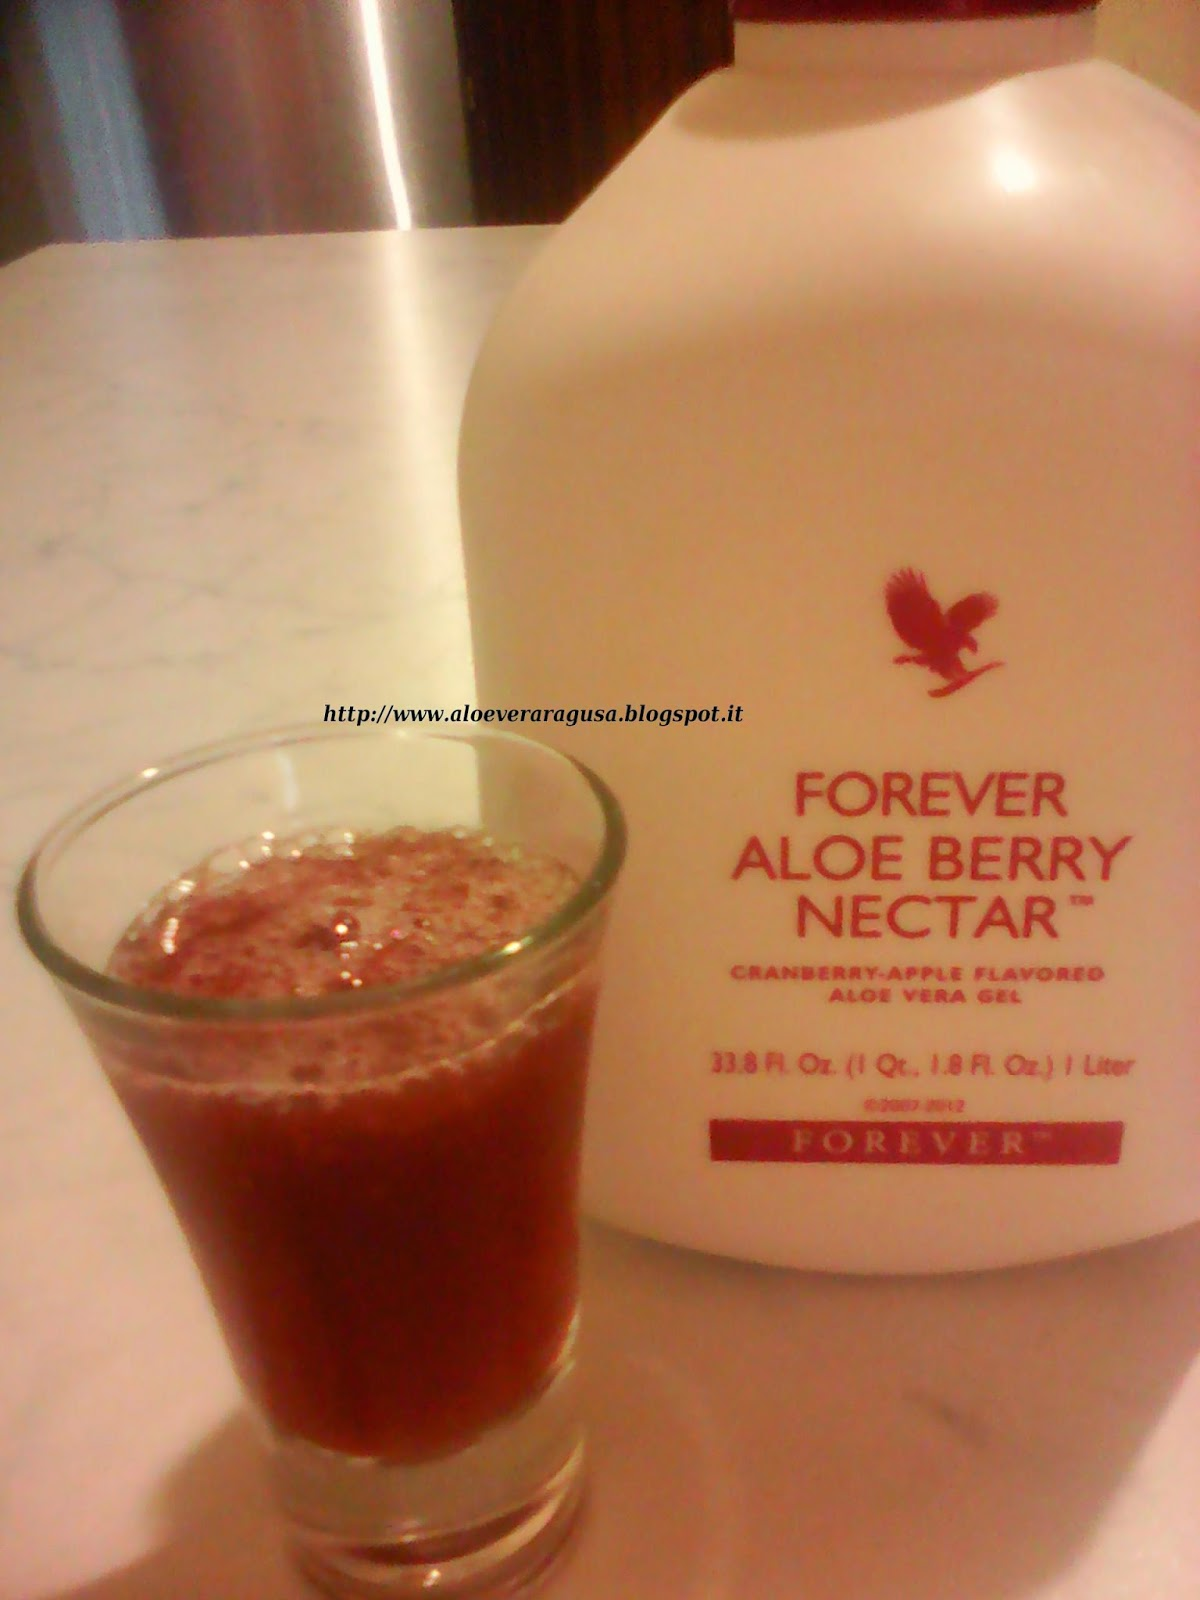 aloe al mirtillo, ALOE BERRY NECTAR, aloe vera gel da bere, ALOE VERA GEL FOREVER, cellulite e aloe berry nctar, cistiti e aloe berry nectar, EMORROIDI E ALOE BERRY NECTAR, varici e aloe berry nectar